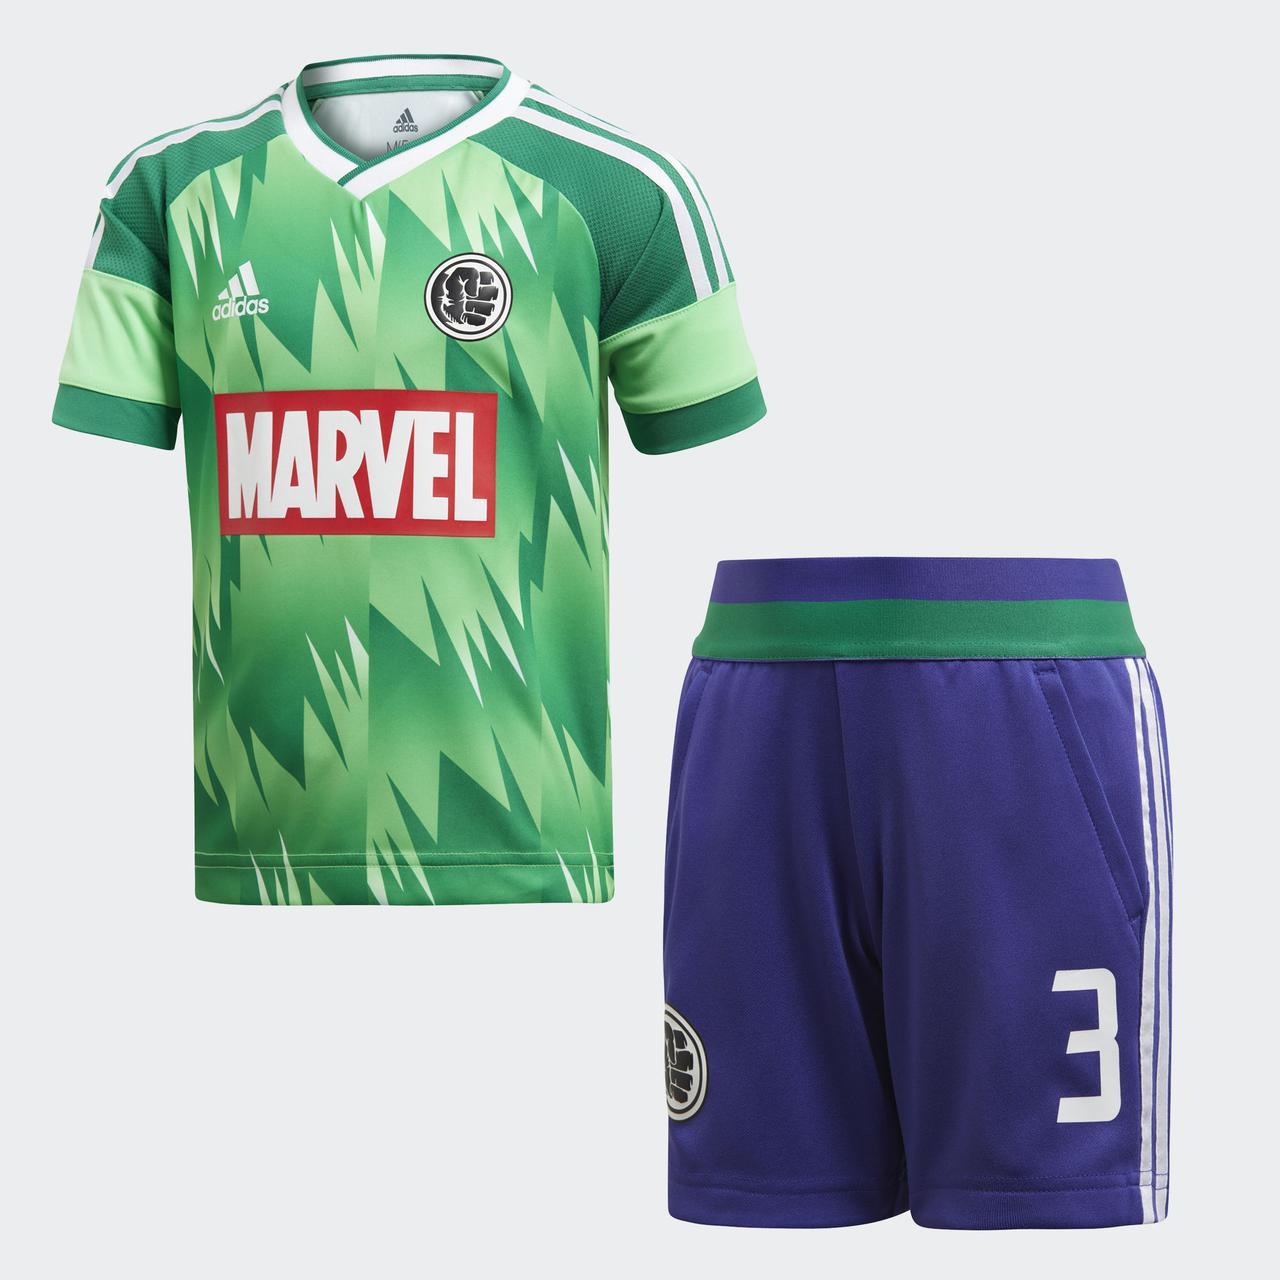 Купить Детский костюм Adidas Performance Marvel Hulk (Артикул ... 0bbaf1dc793